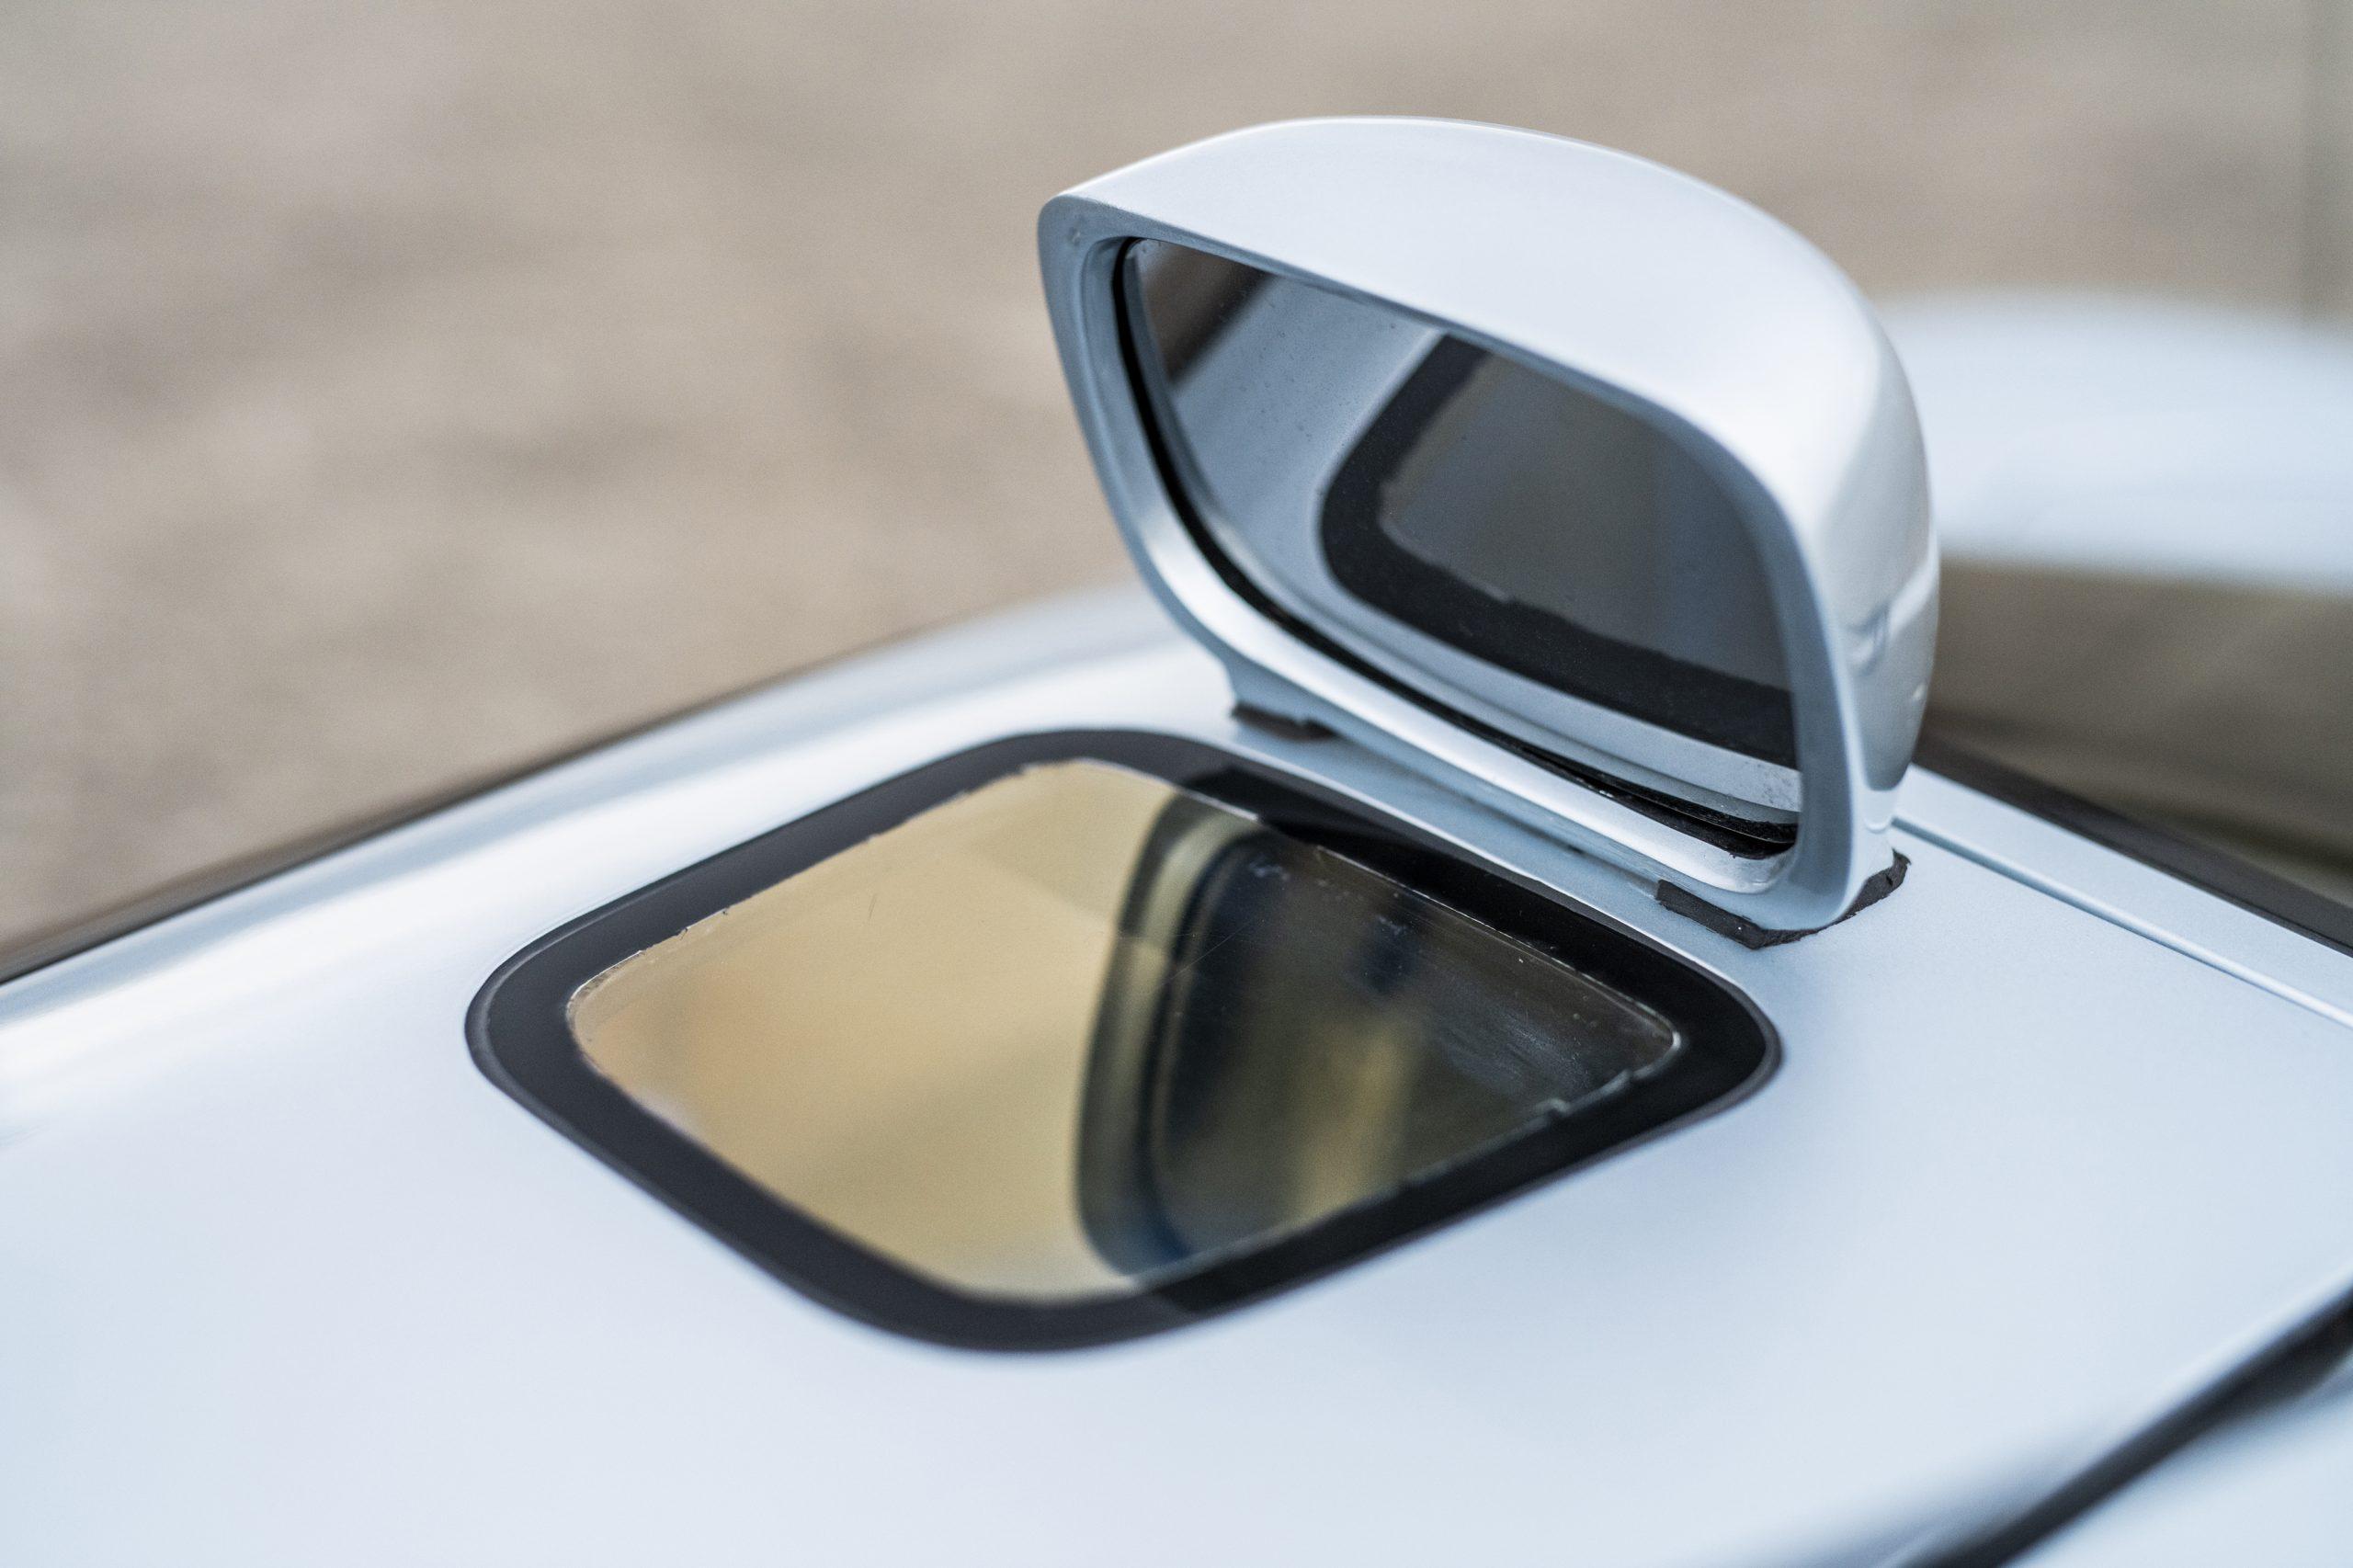 1993 Isdera Commendatore 112i rear mirror glass detail